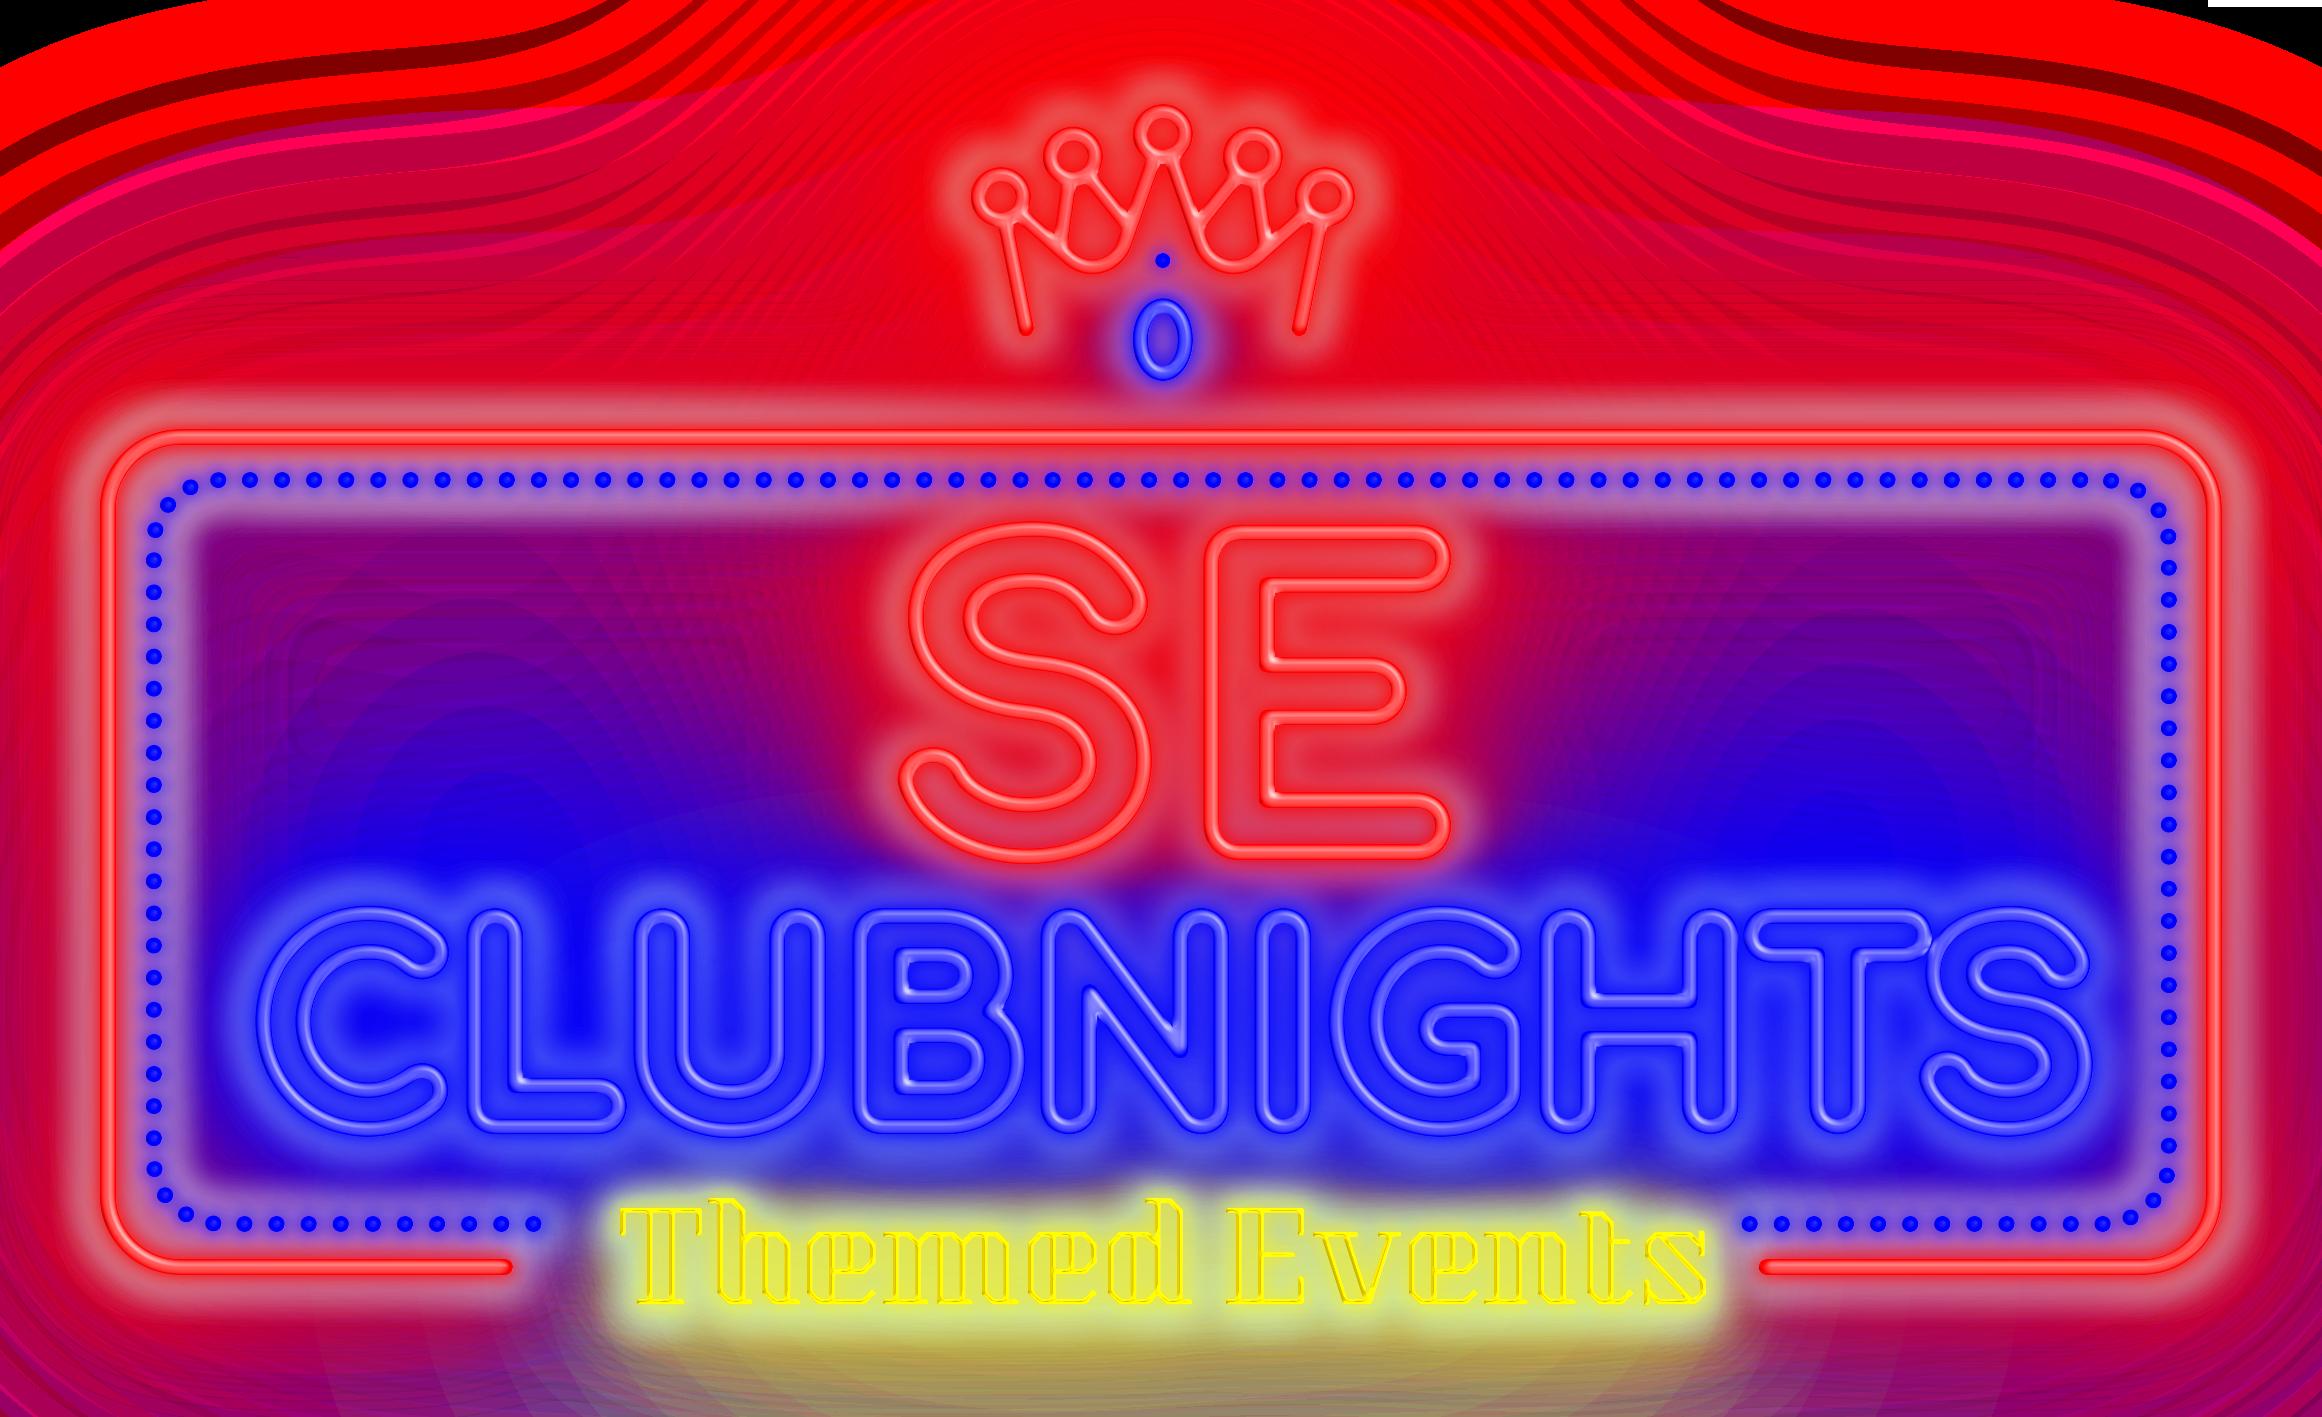 SE Club Nights